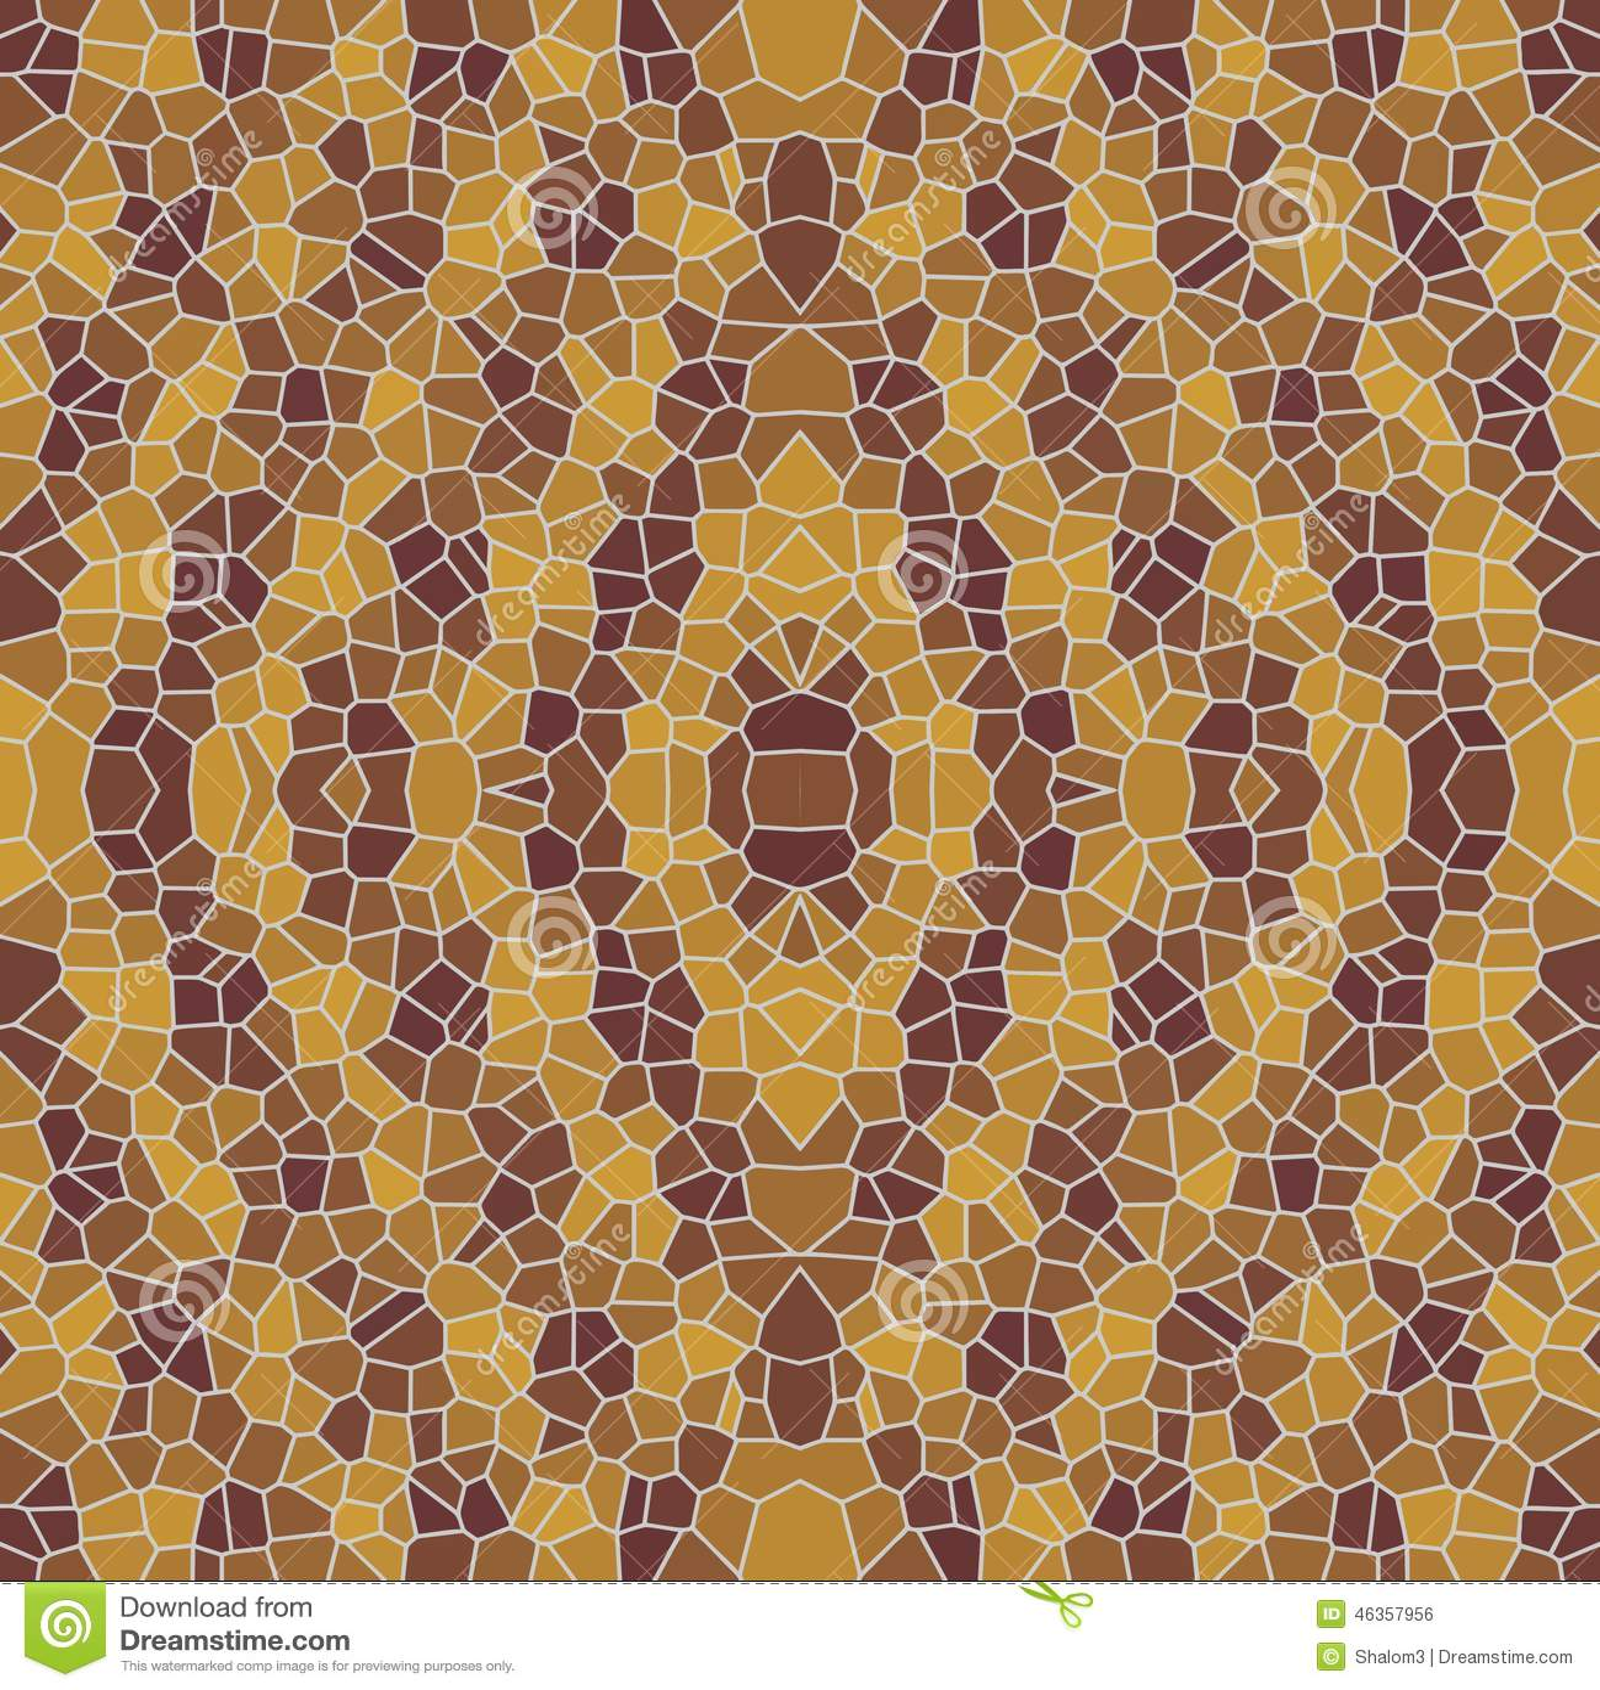 Seamless Brown Mosaic Patterns Stock Illustration - Image: 46357956